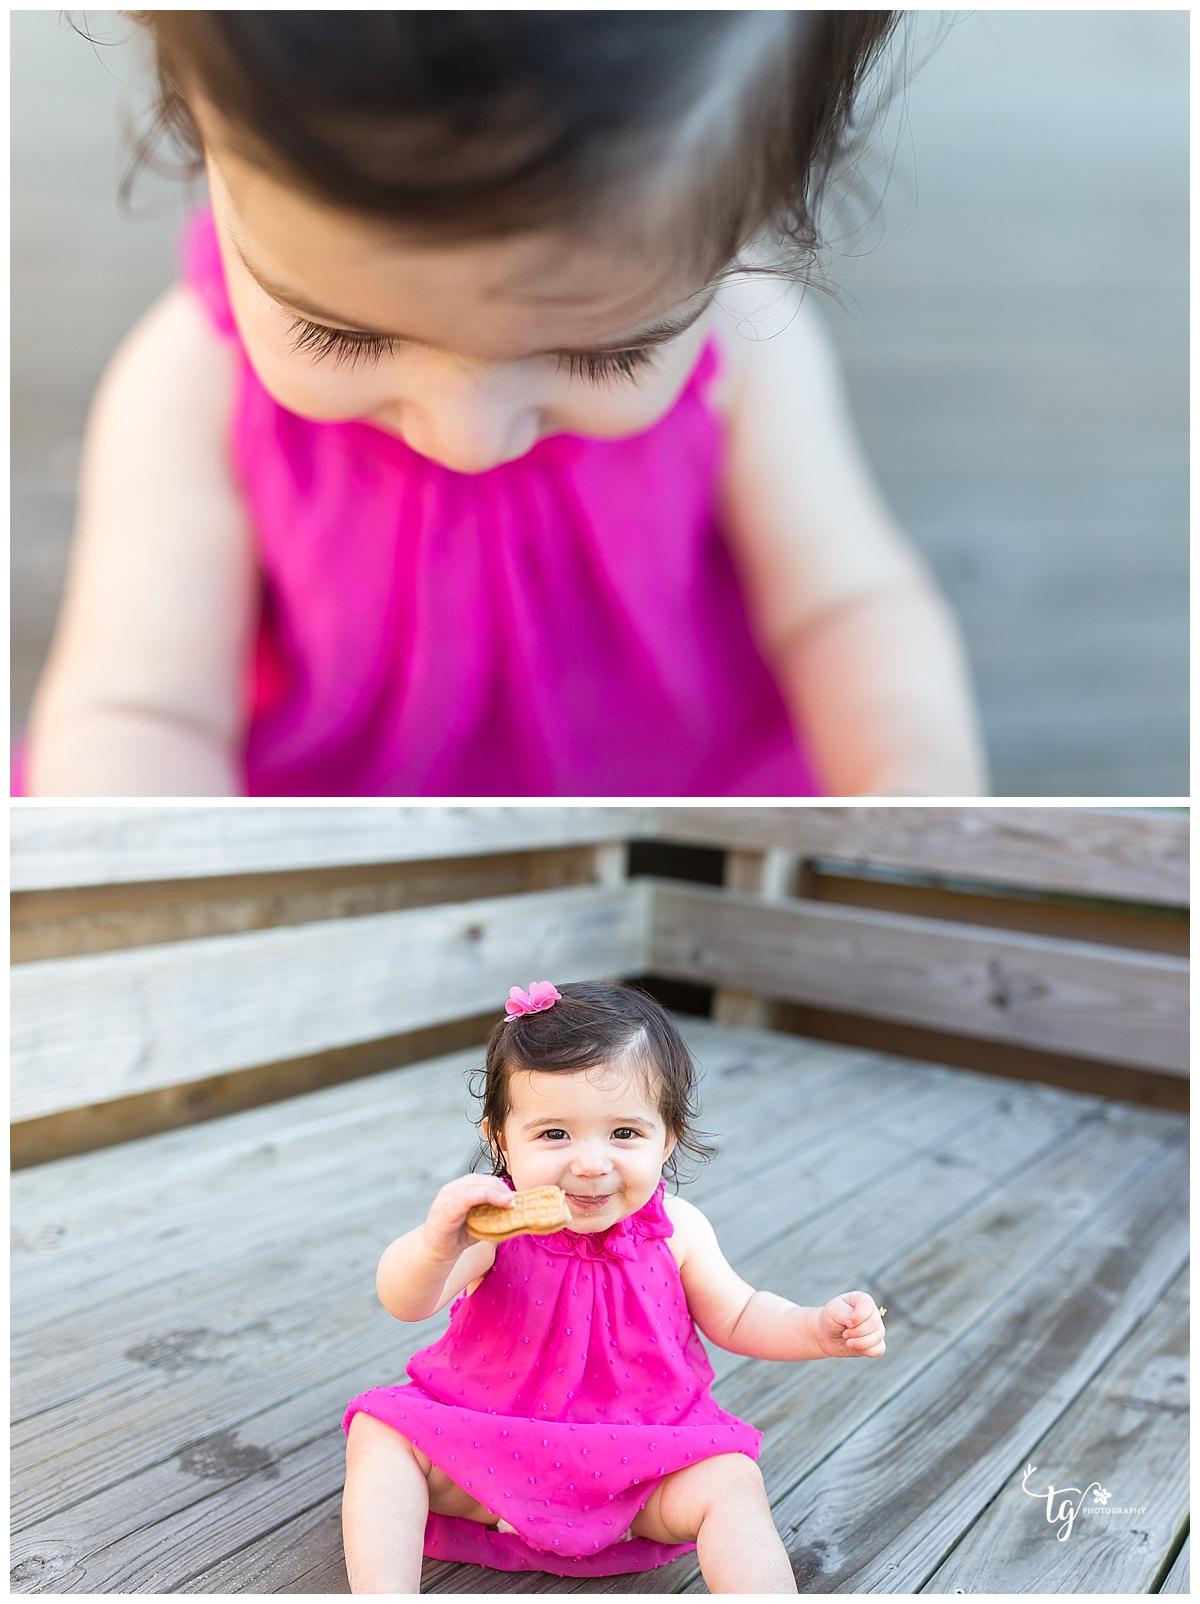 photographer for outdoor photos of children